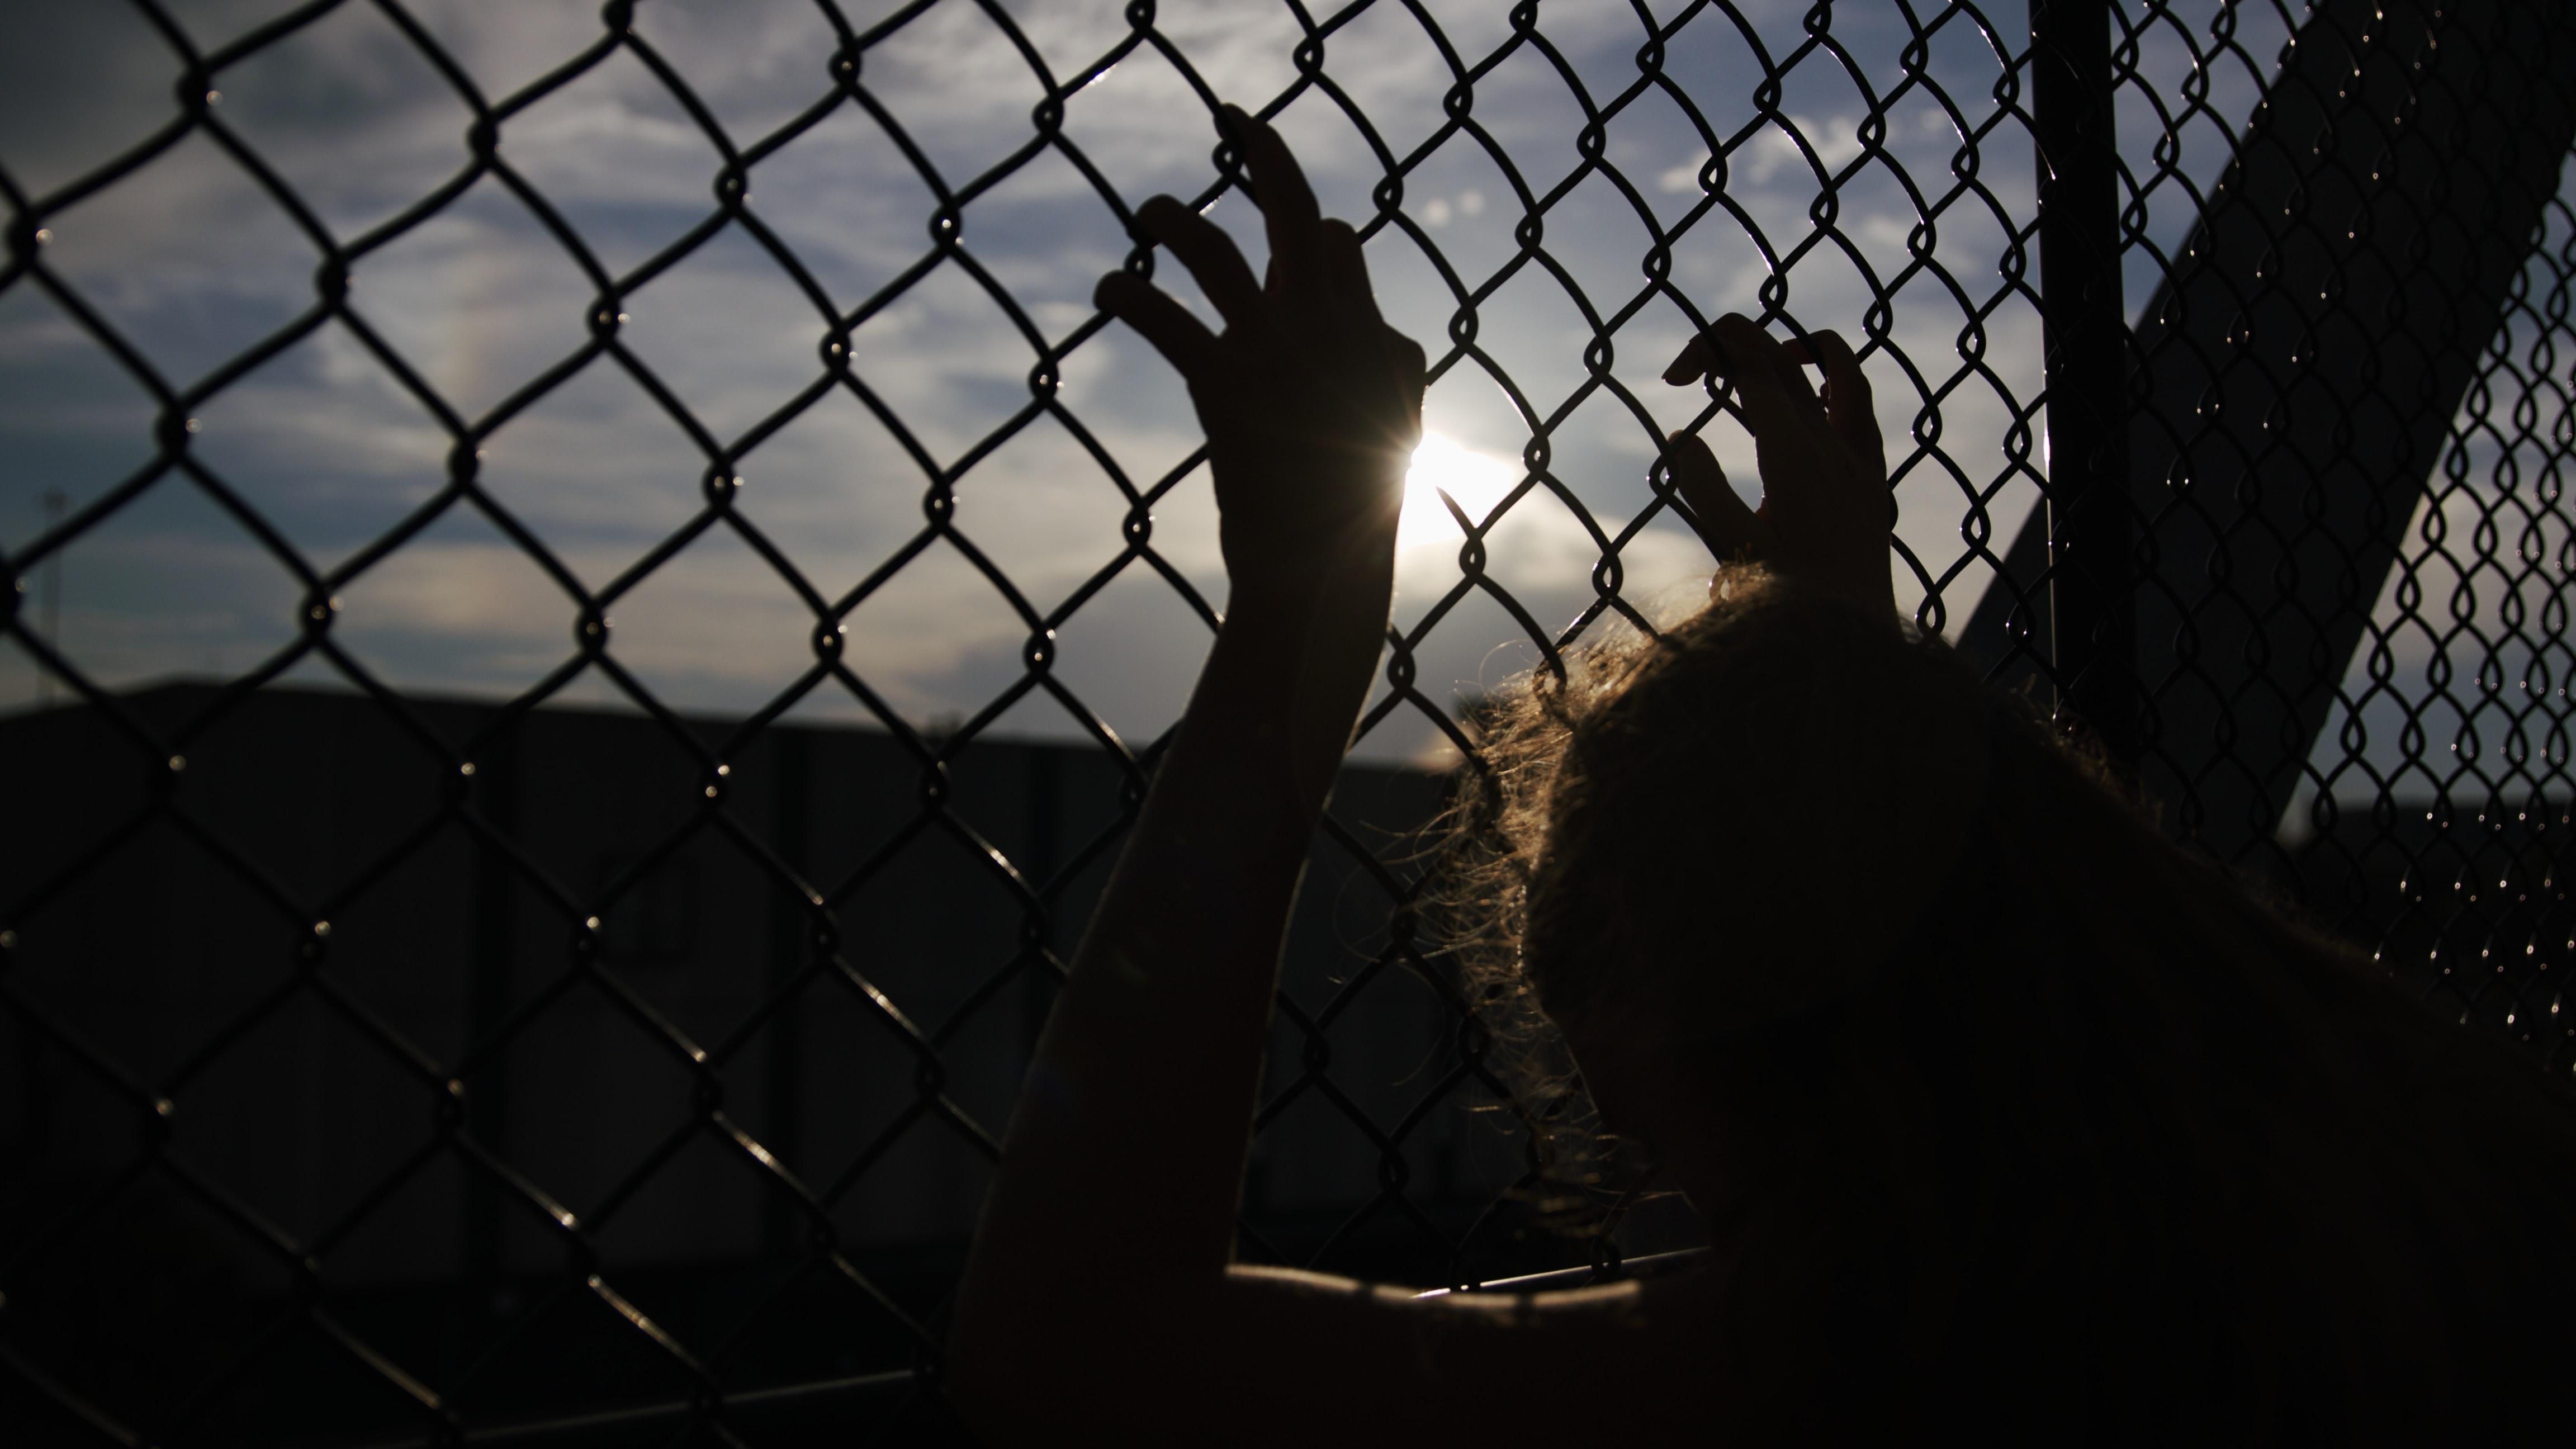 Let's End Human Trafficking